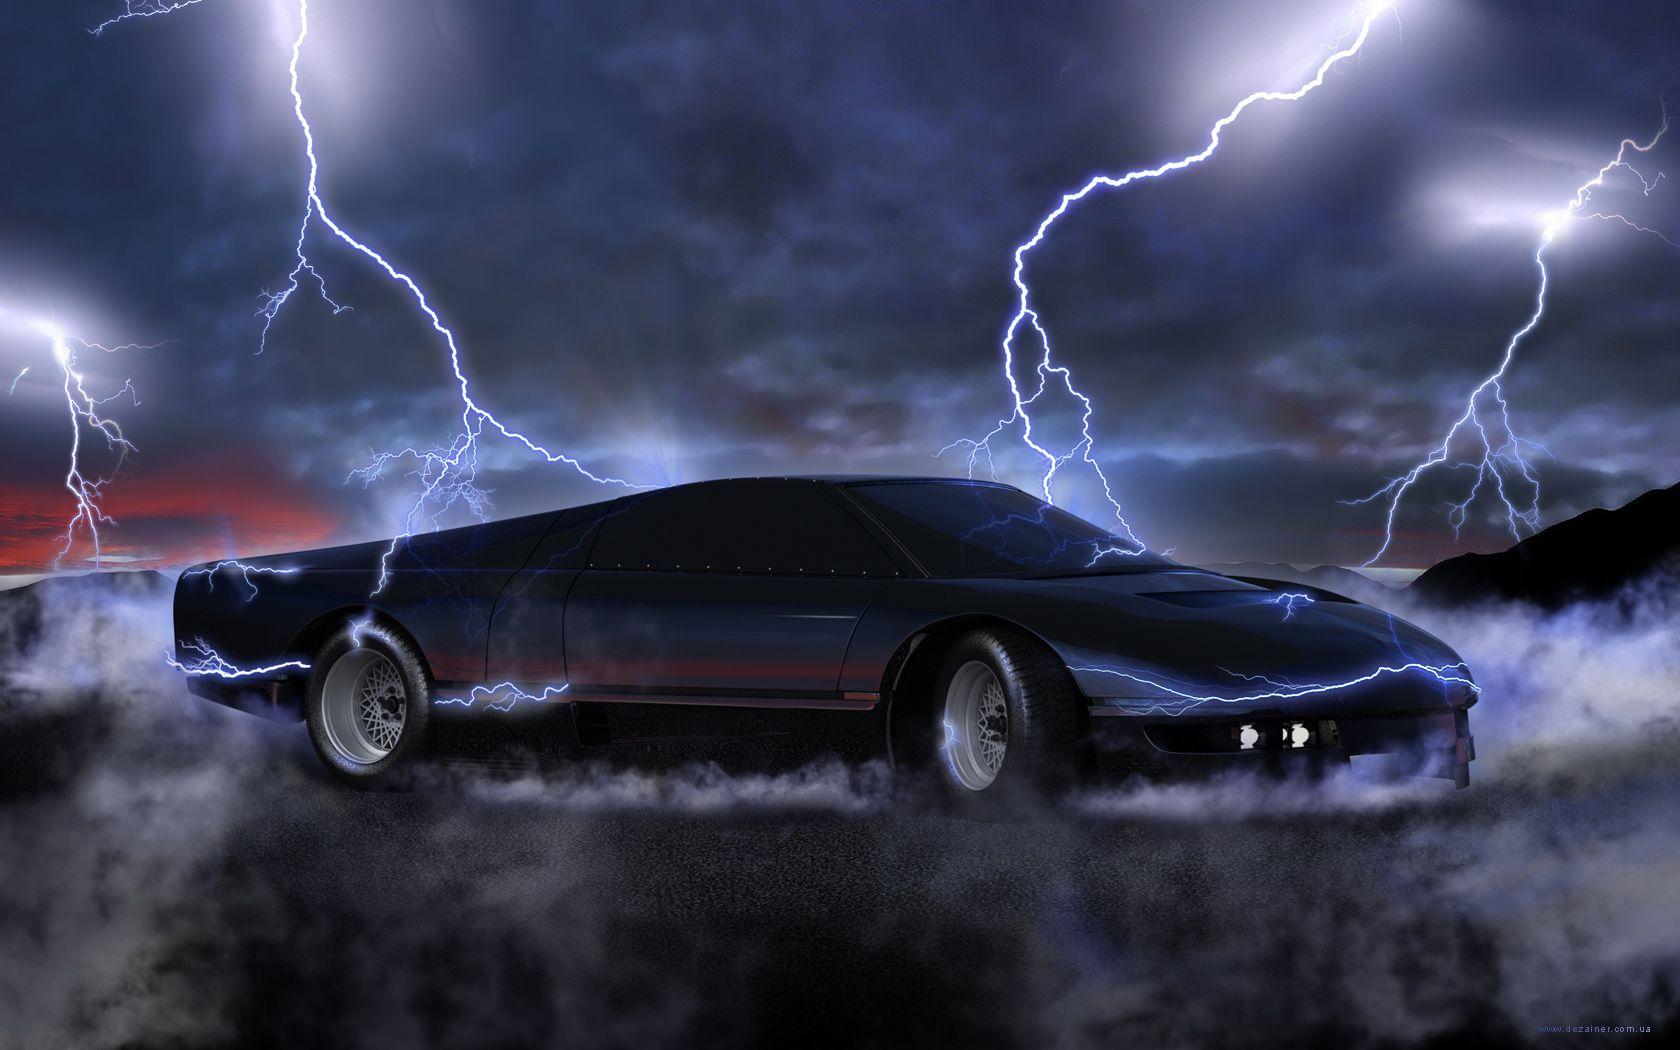 The Wraith Car: The Wraith Turbo Interceptor - Bing Images